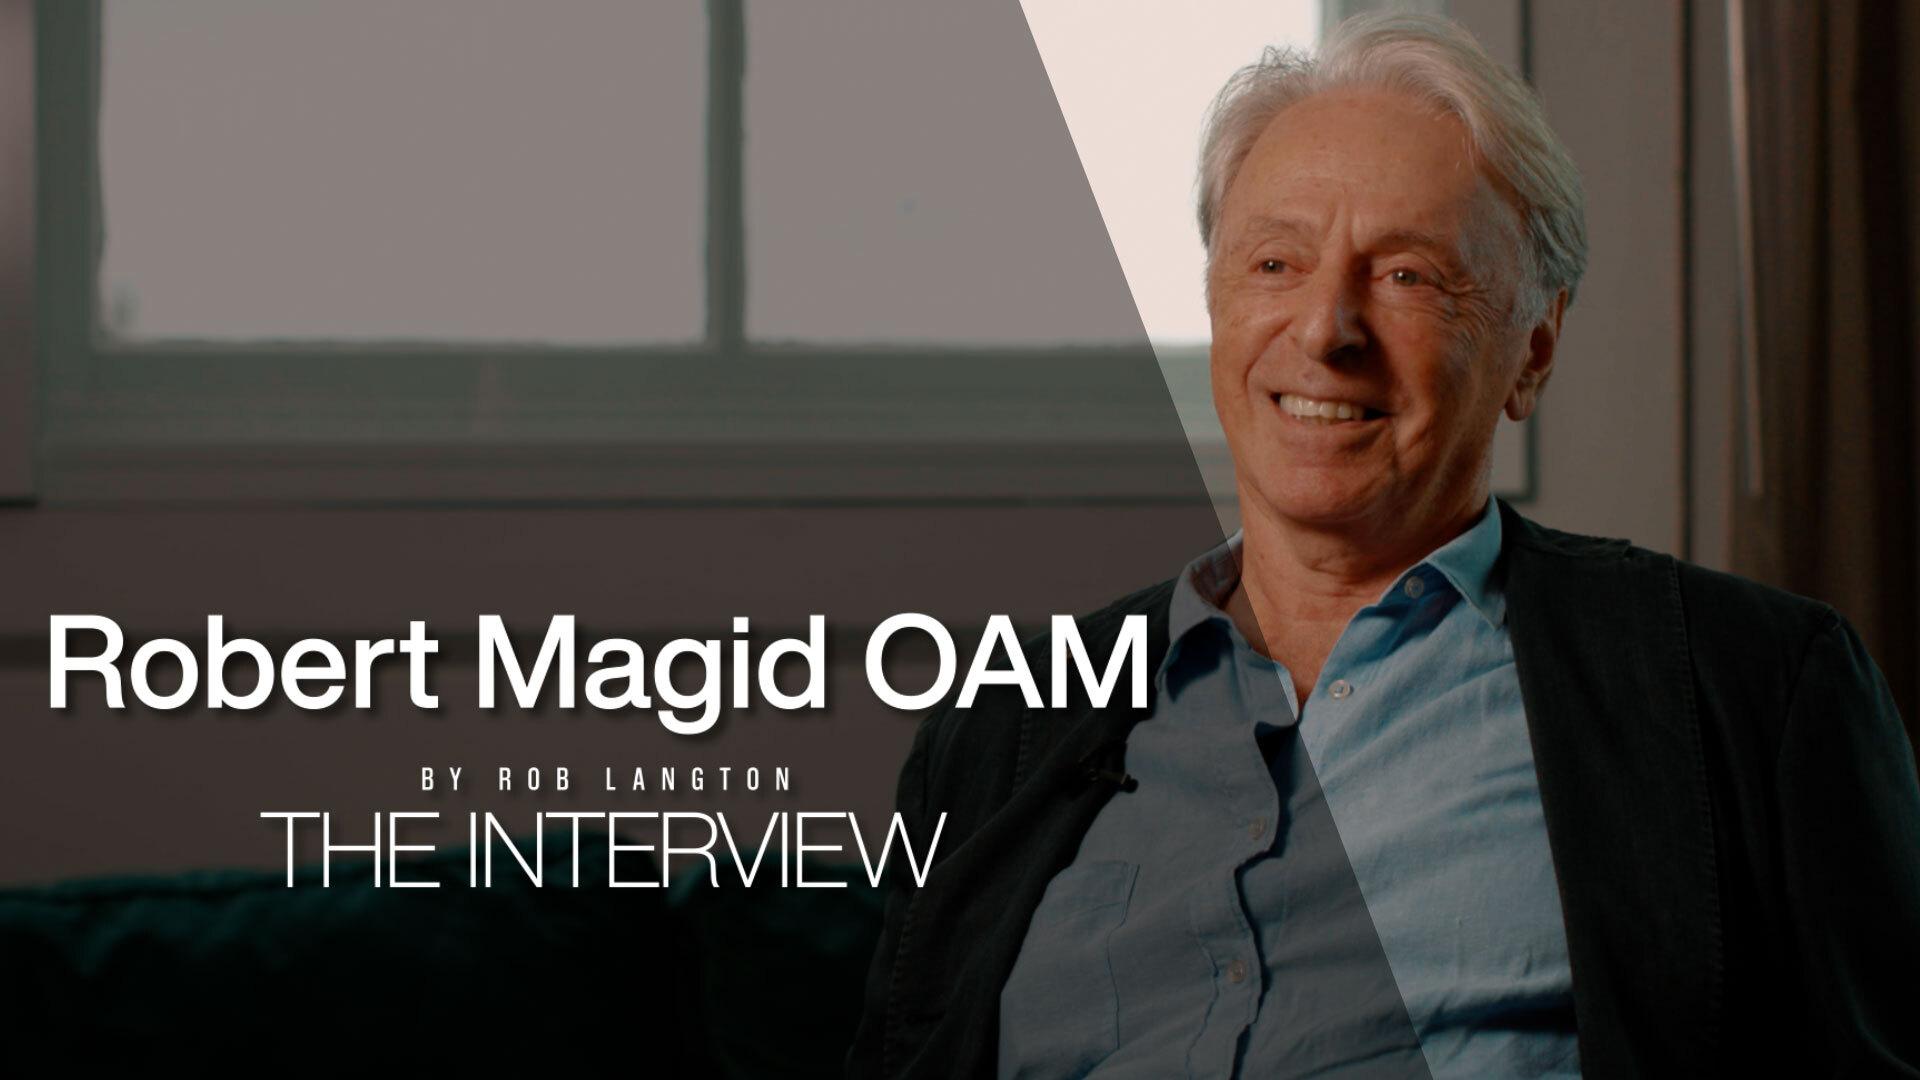 Robert Magid OAM